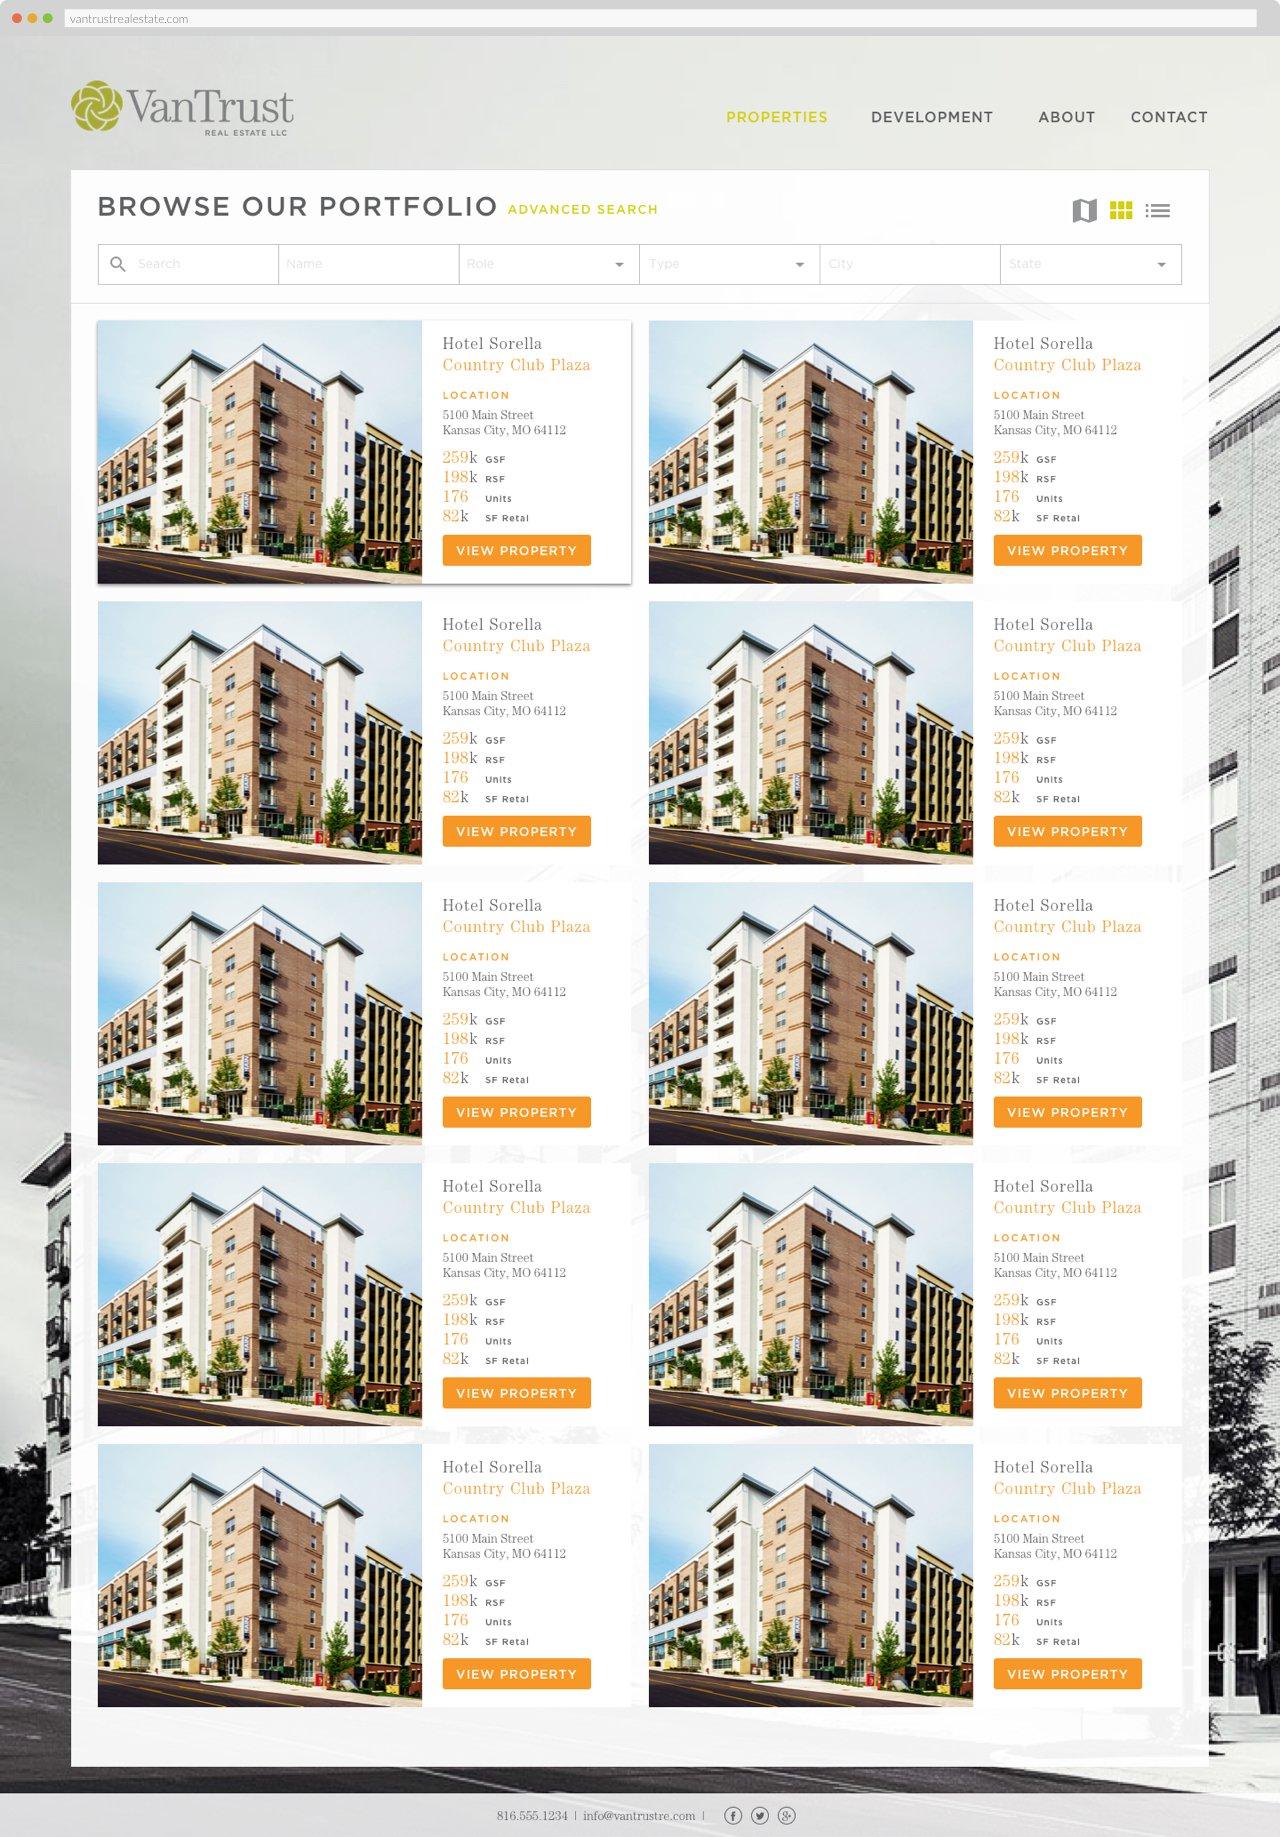 VanTrust Real Estate - Property Search, Grid View